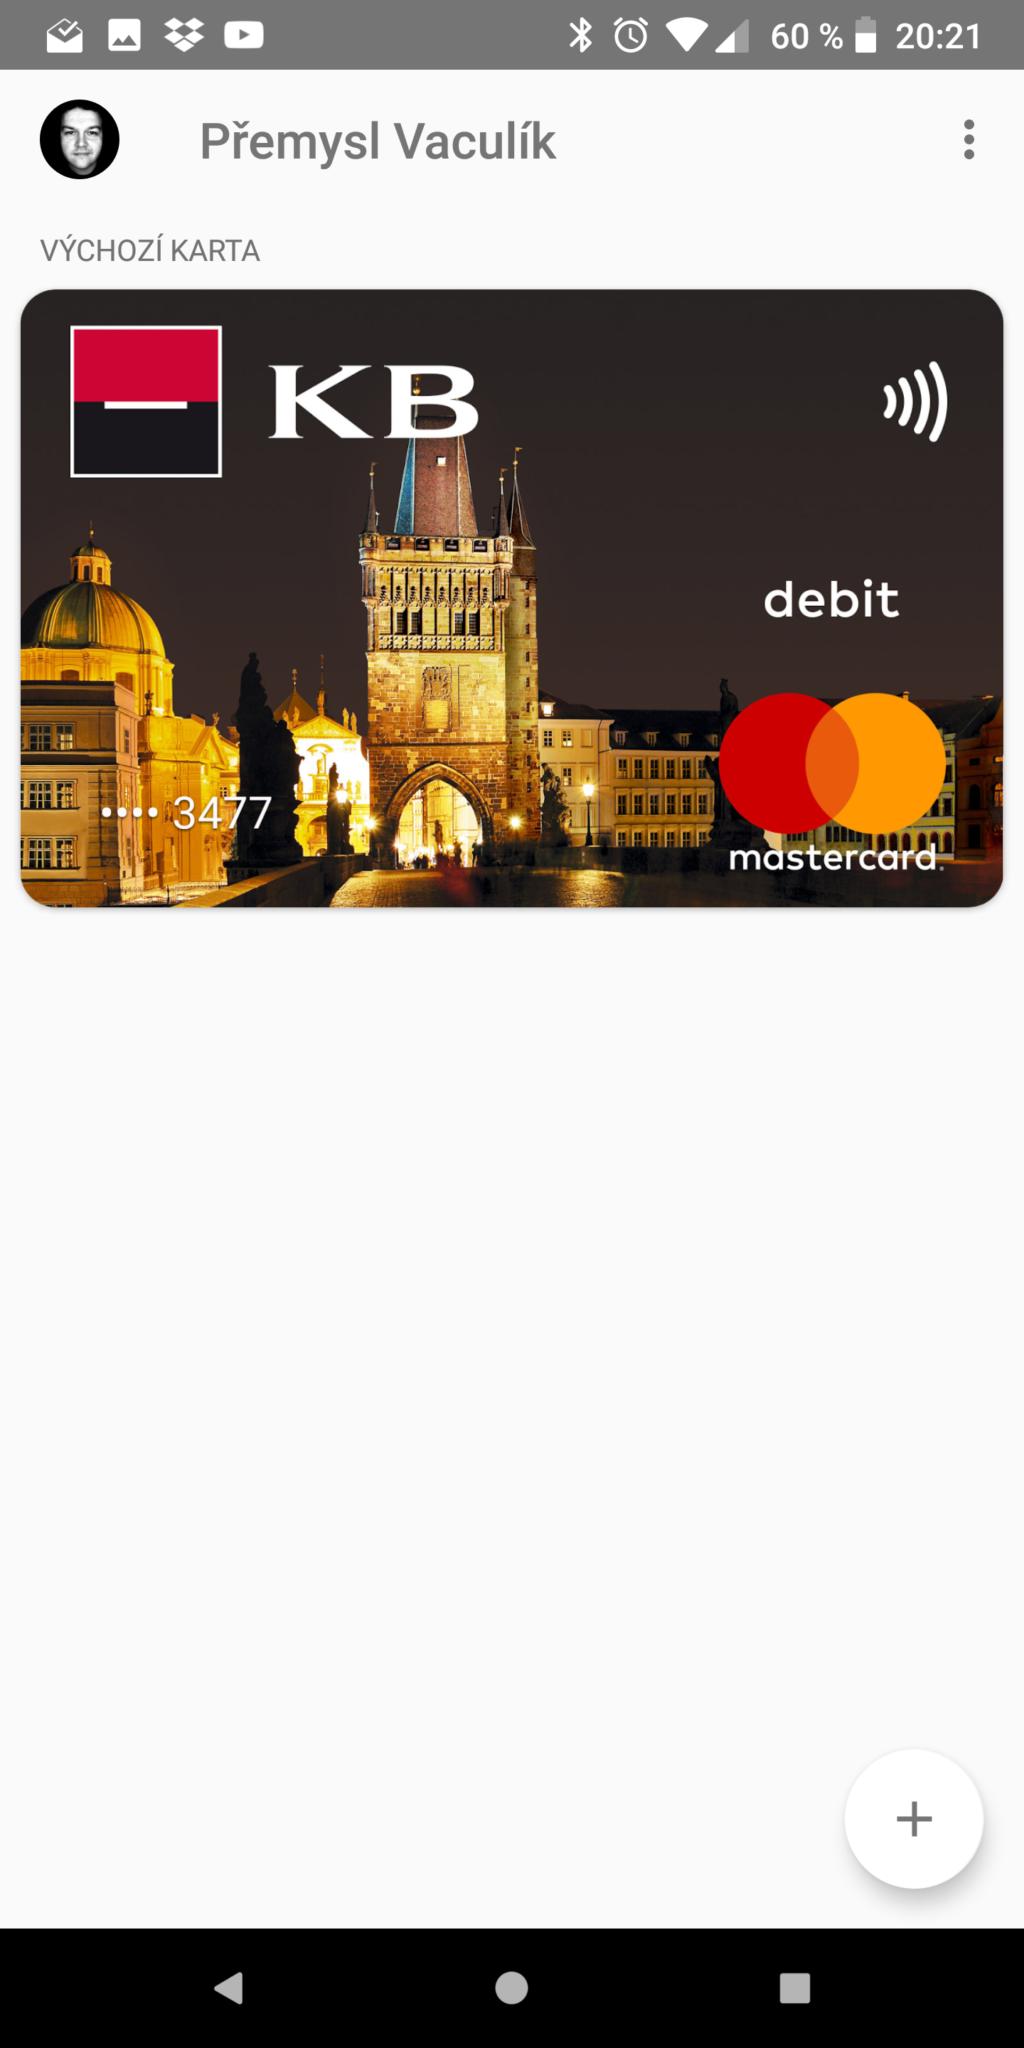 Komercni Banka Aktivovala Android Pay Pro Sve Klienty Dotekomanie Cz